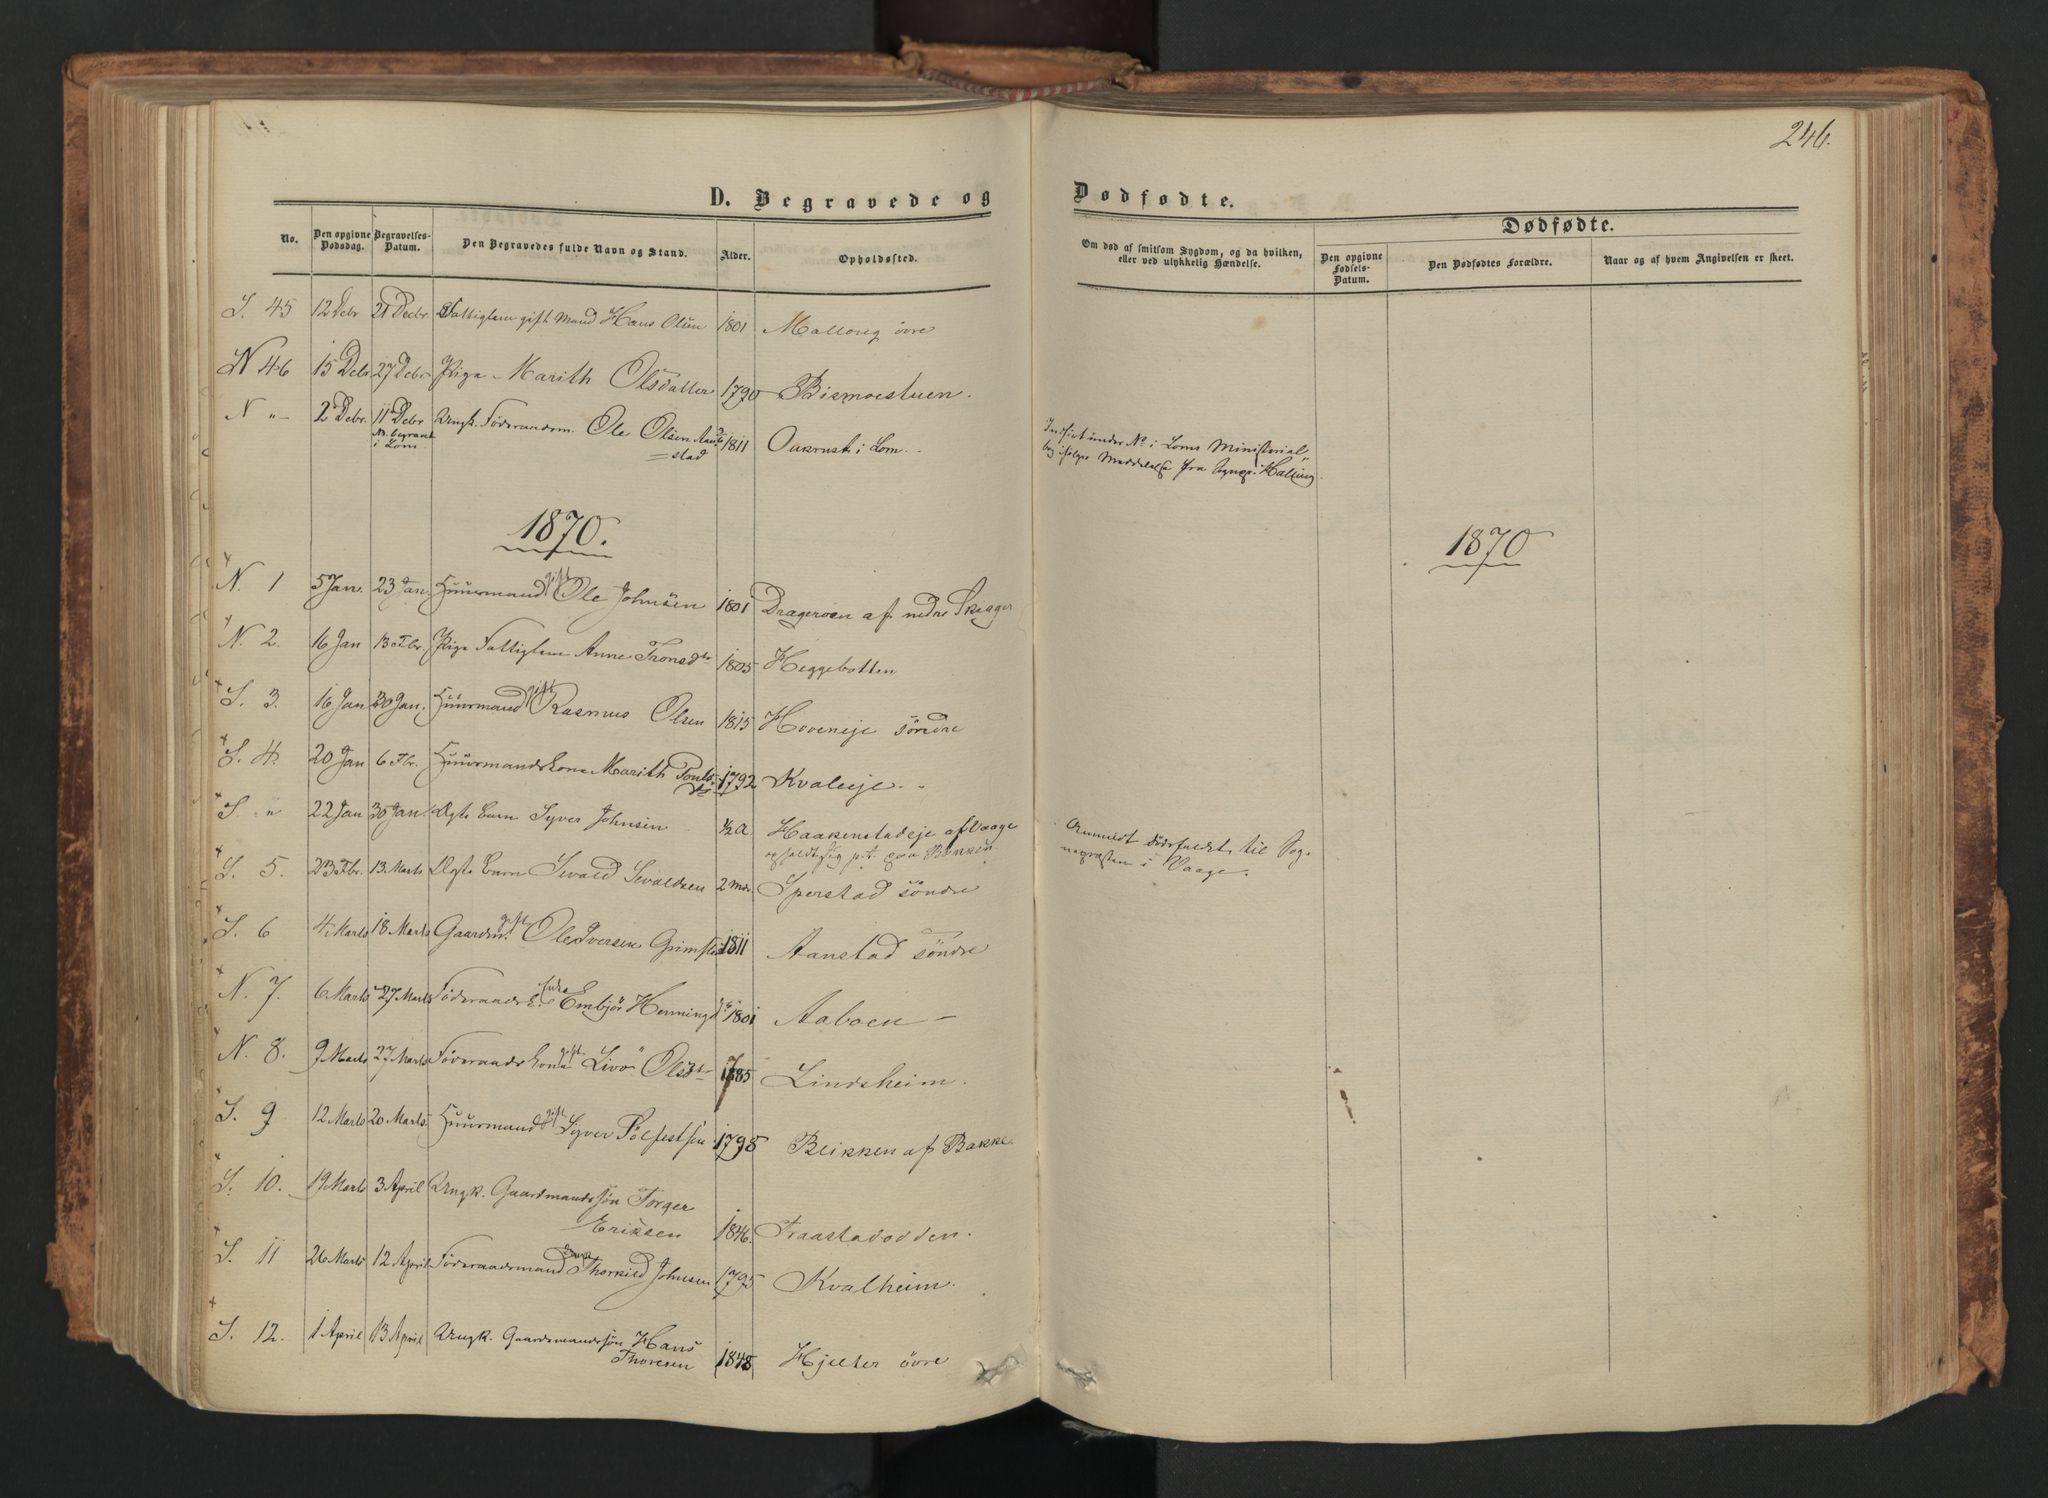 SAH, Skjåk prestekontor, Ministerialbok nr. 1, 1863-1879, s. 246